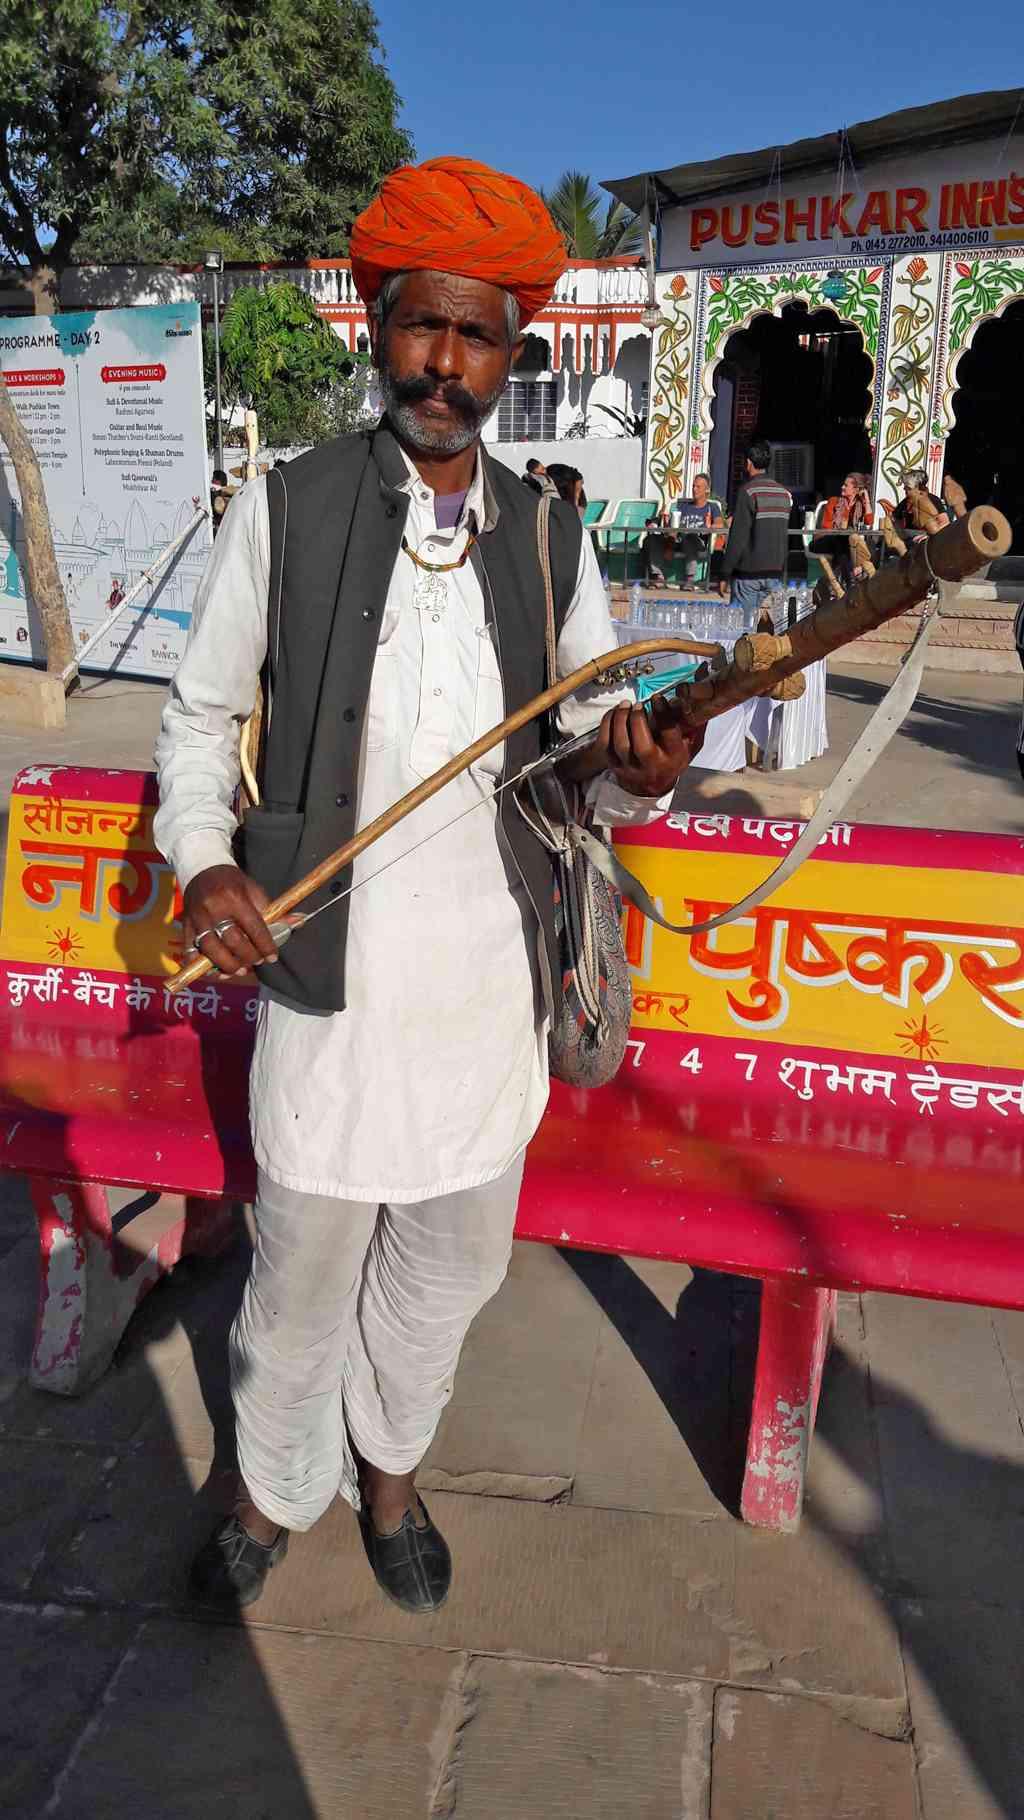 traditional Rajasthani musician shows off his ravanahatha